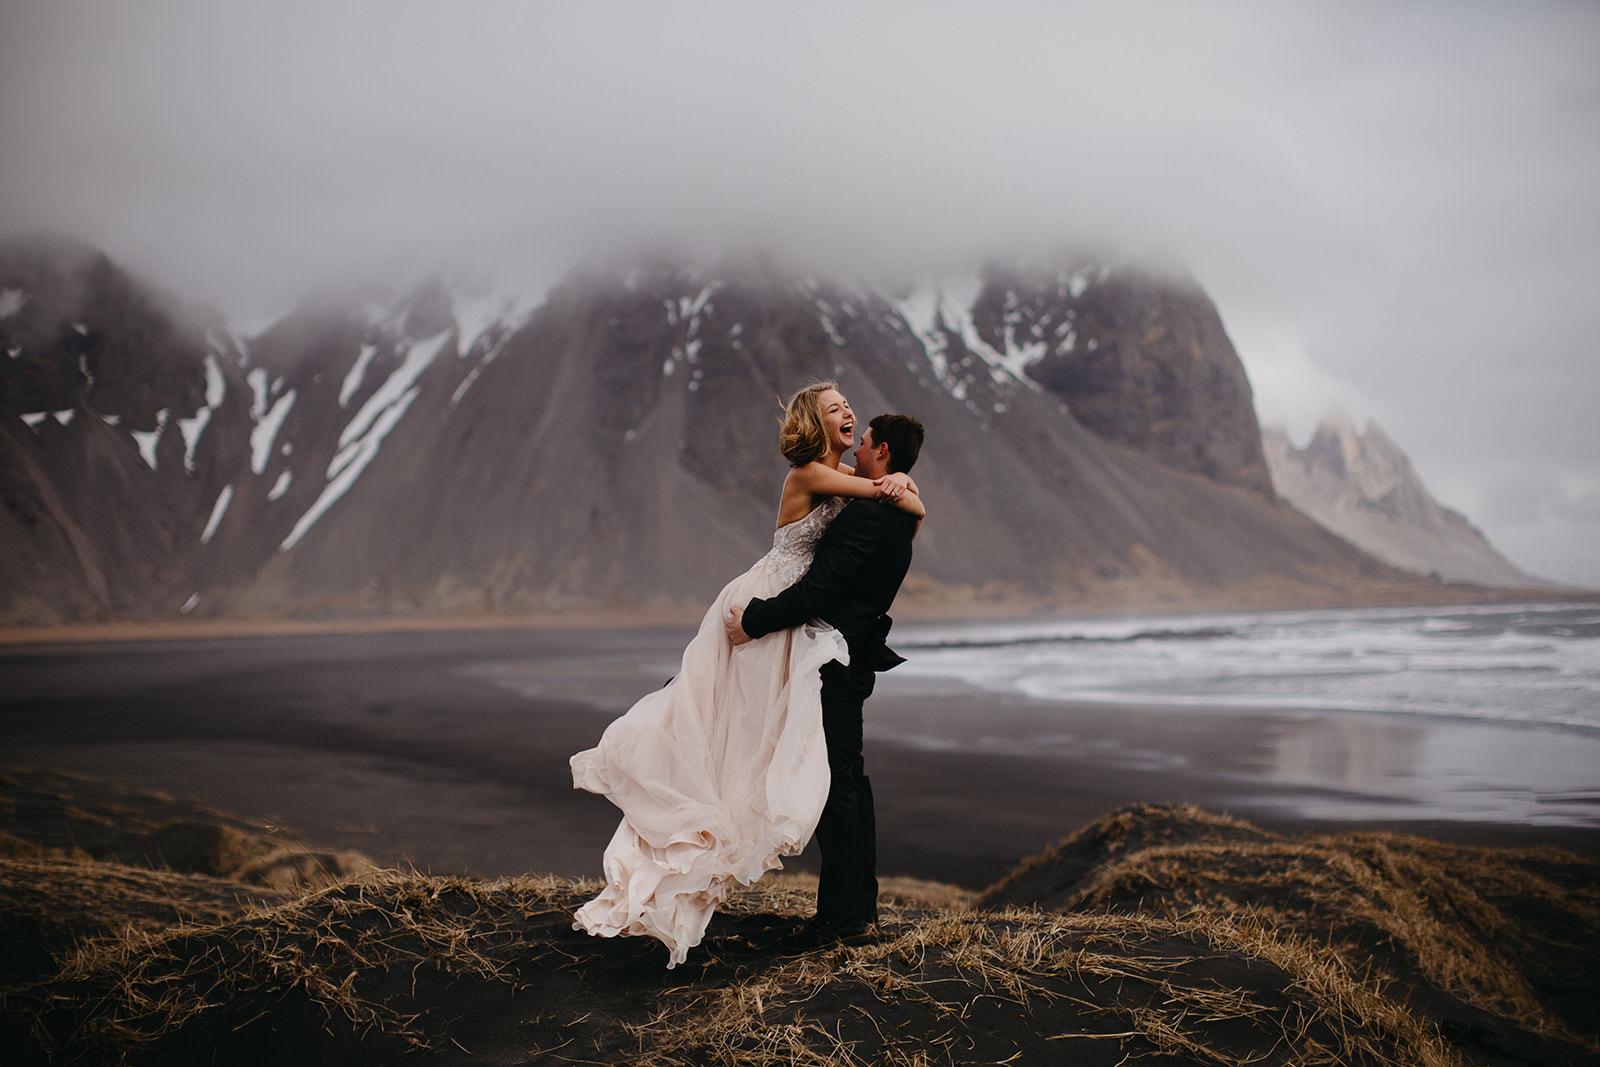 Icelandic Iceland Elopement Wedding Elope Photographer Eloping Reykjavík Vik Black Sand Beach Jökulsárlón Skogafoss Waterfall Vestrahorn Mountain Liz Osban Photography Destination 32.jpg